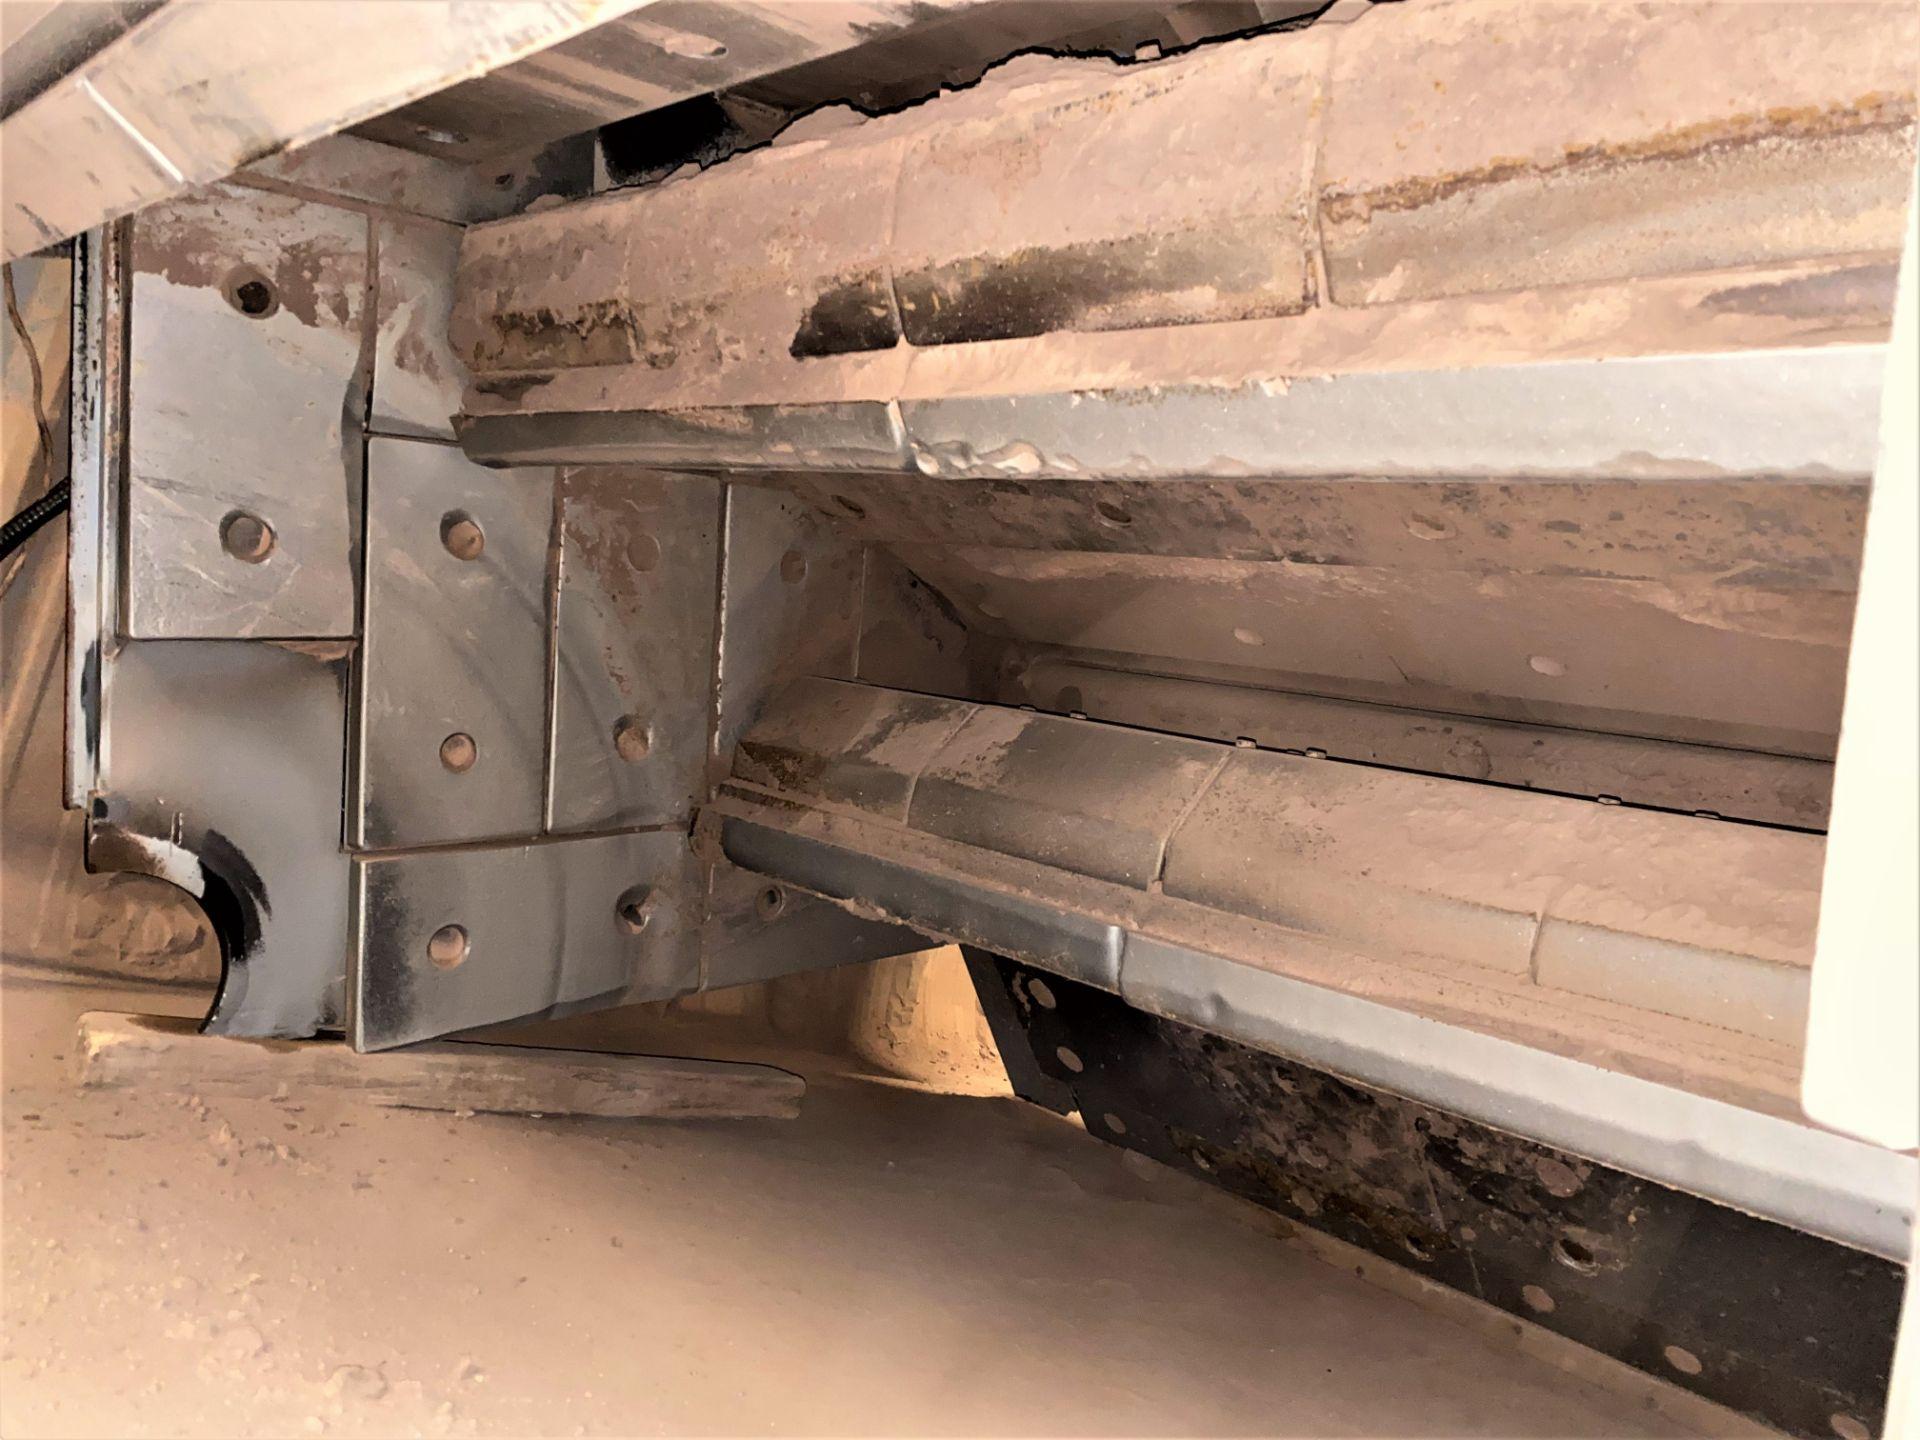 HAZEMAG IMPACT CRUSHER, MODEL 1315, 60'' DIAMETER ROTOR, 60'' WIDE, 575V, 450 HP - Image 6 of 25